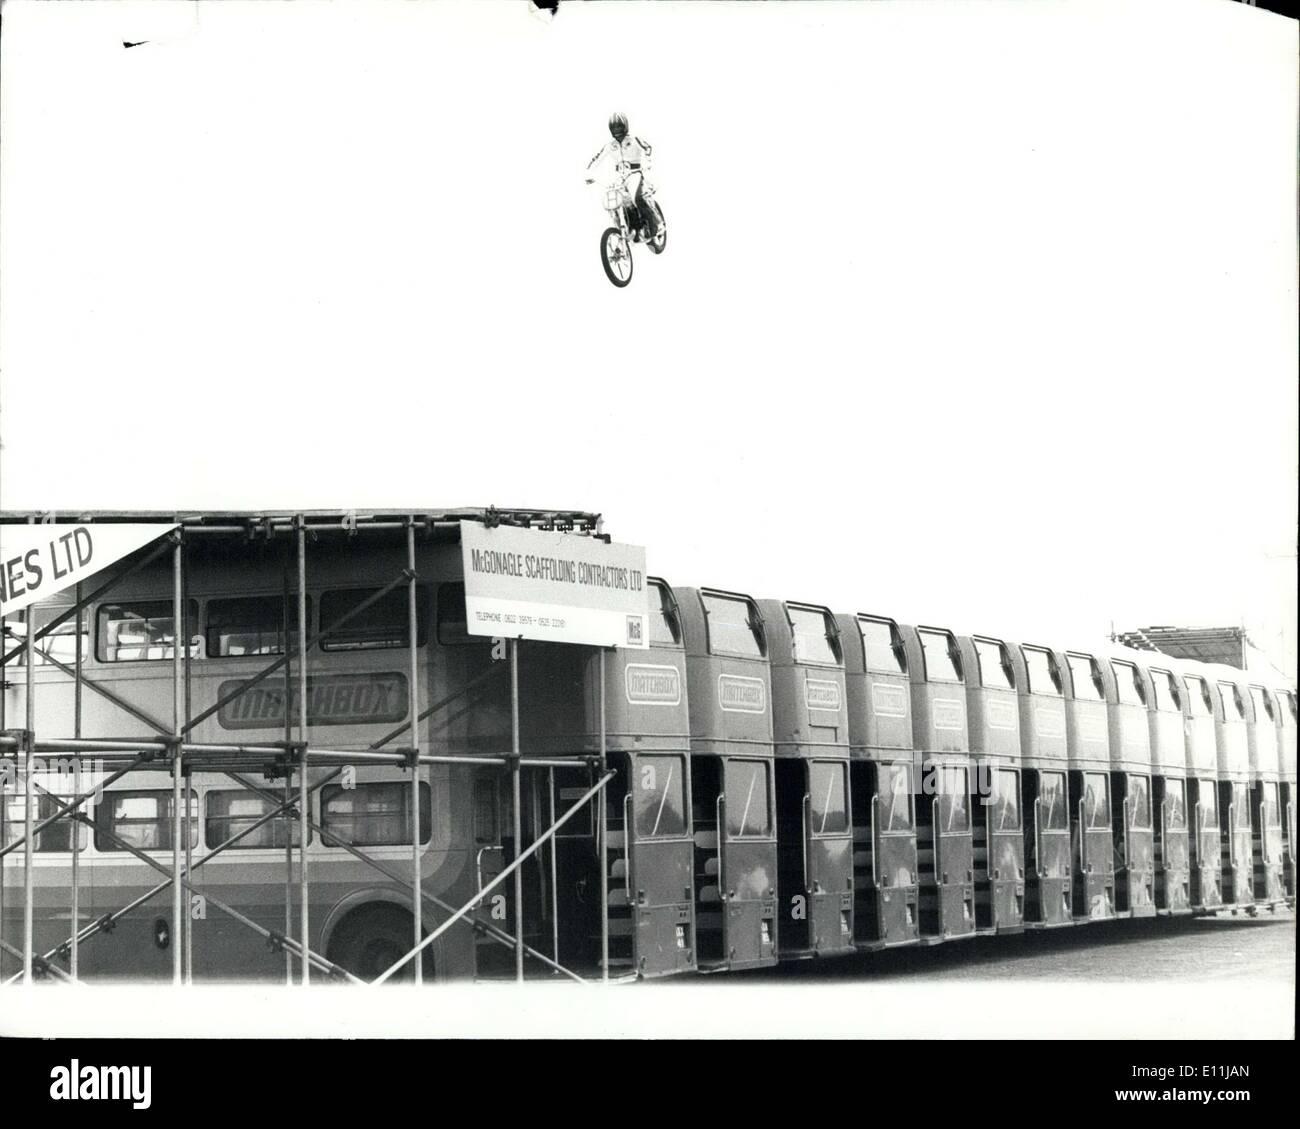 Apr. 08, 1978 - Eddie Kidd breaks world record motor cycle jump: Cockney stunt ace 18 year old Eddie Kidd, today Stock Photo